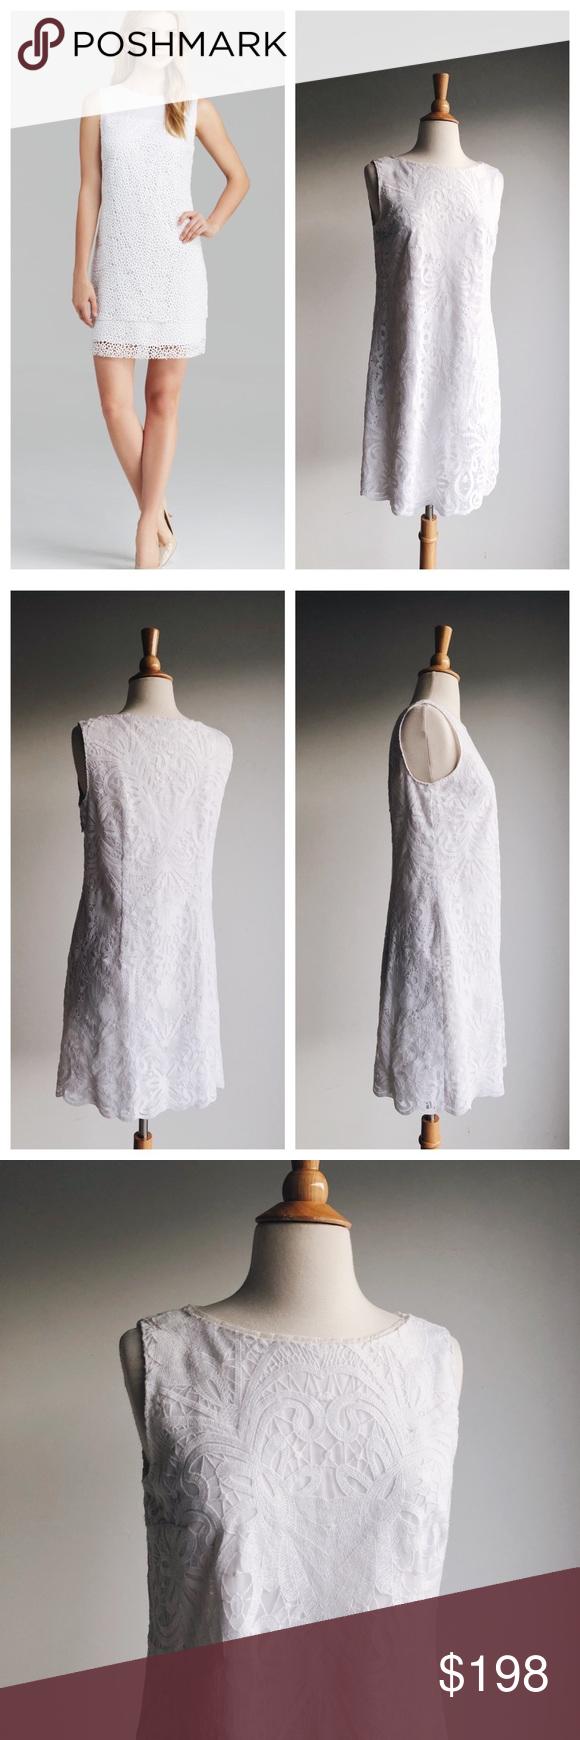 Elie Tahari White Lace Sheath Dress 6 Stunning White Lace Dress From Elie Tahari Same Fit As The Lillian F Lace Sheath Dress Lace White Dress Elie Tahari [ 1740 x 580 Pixel ]